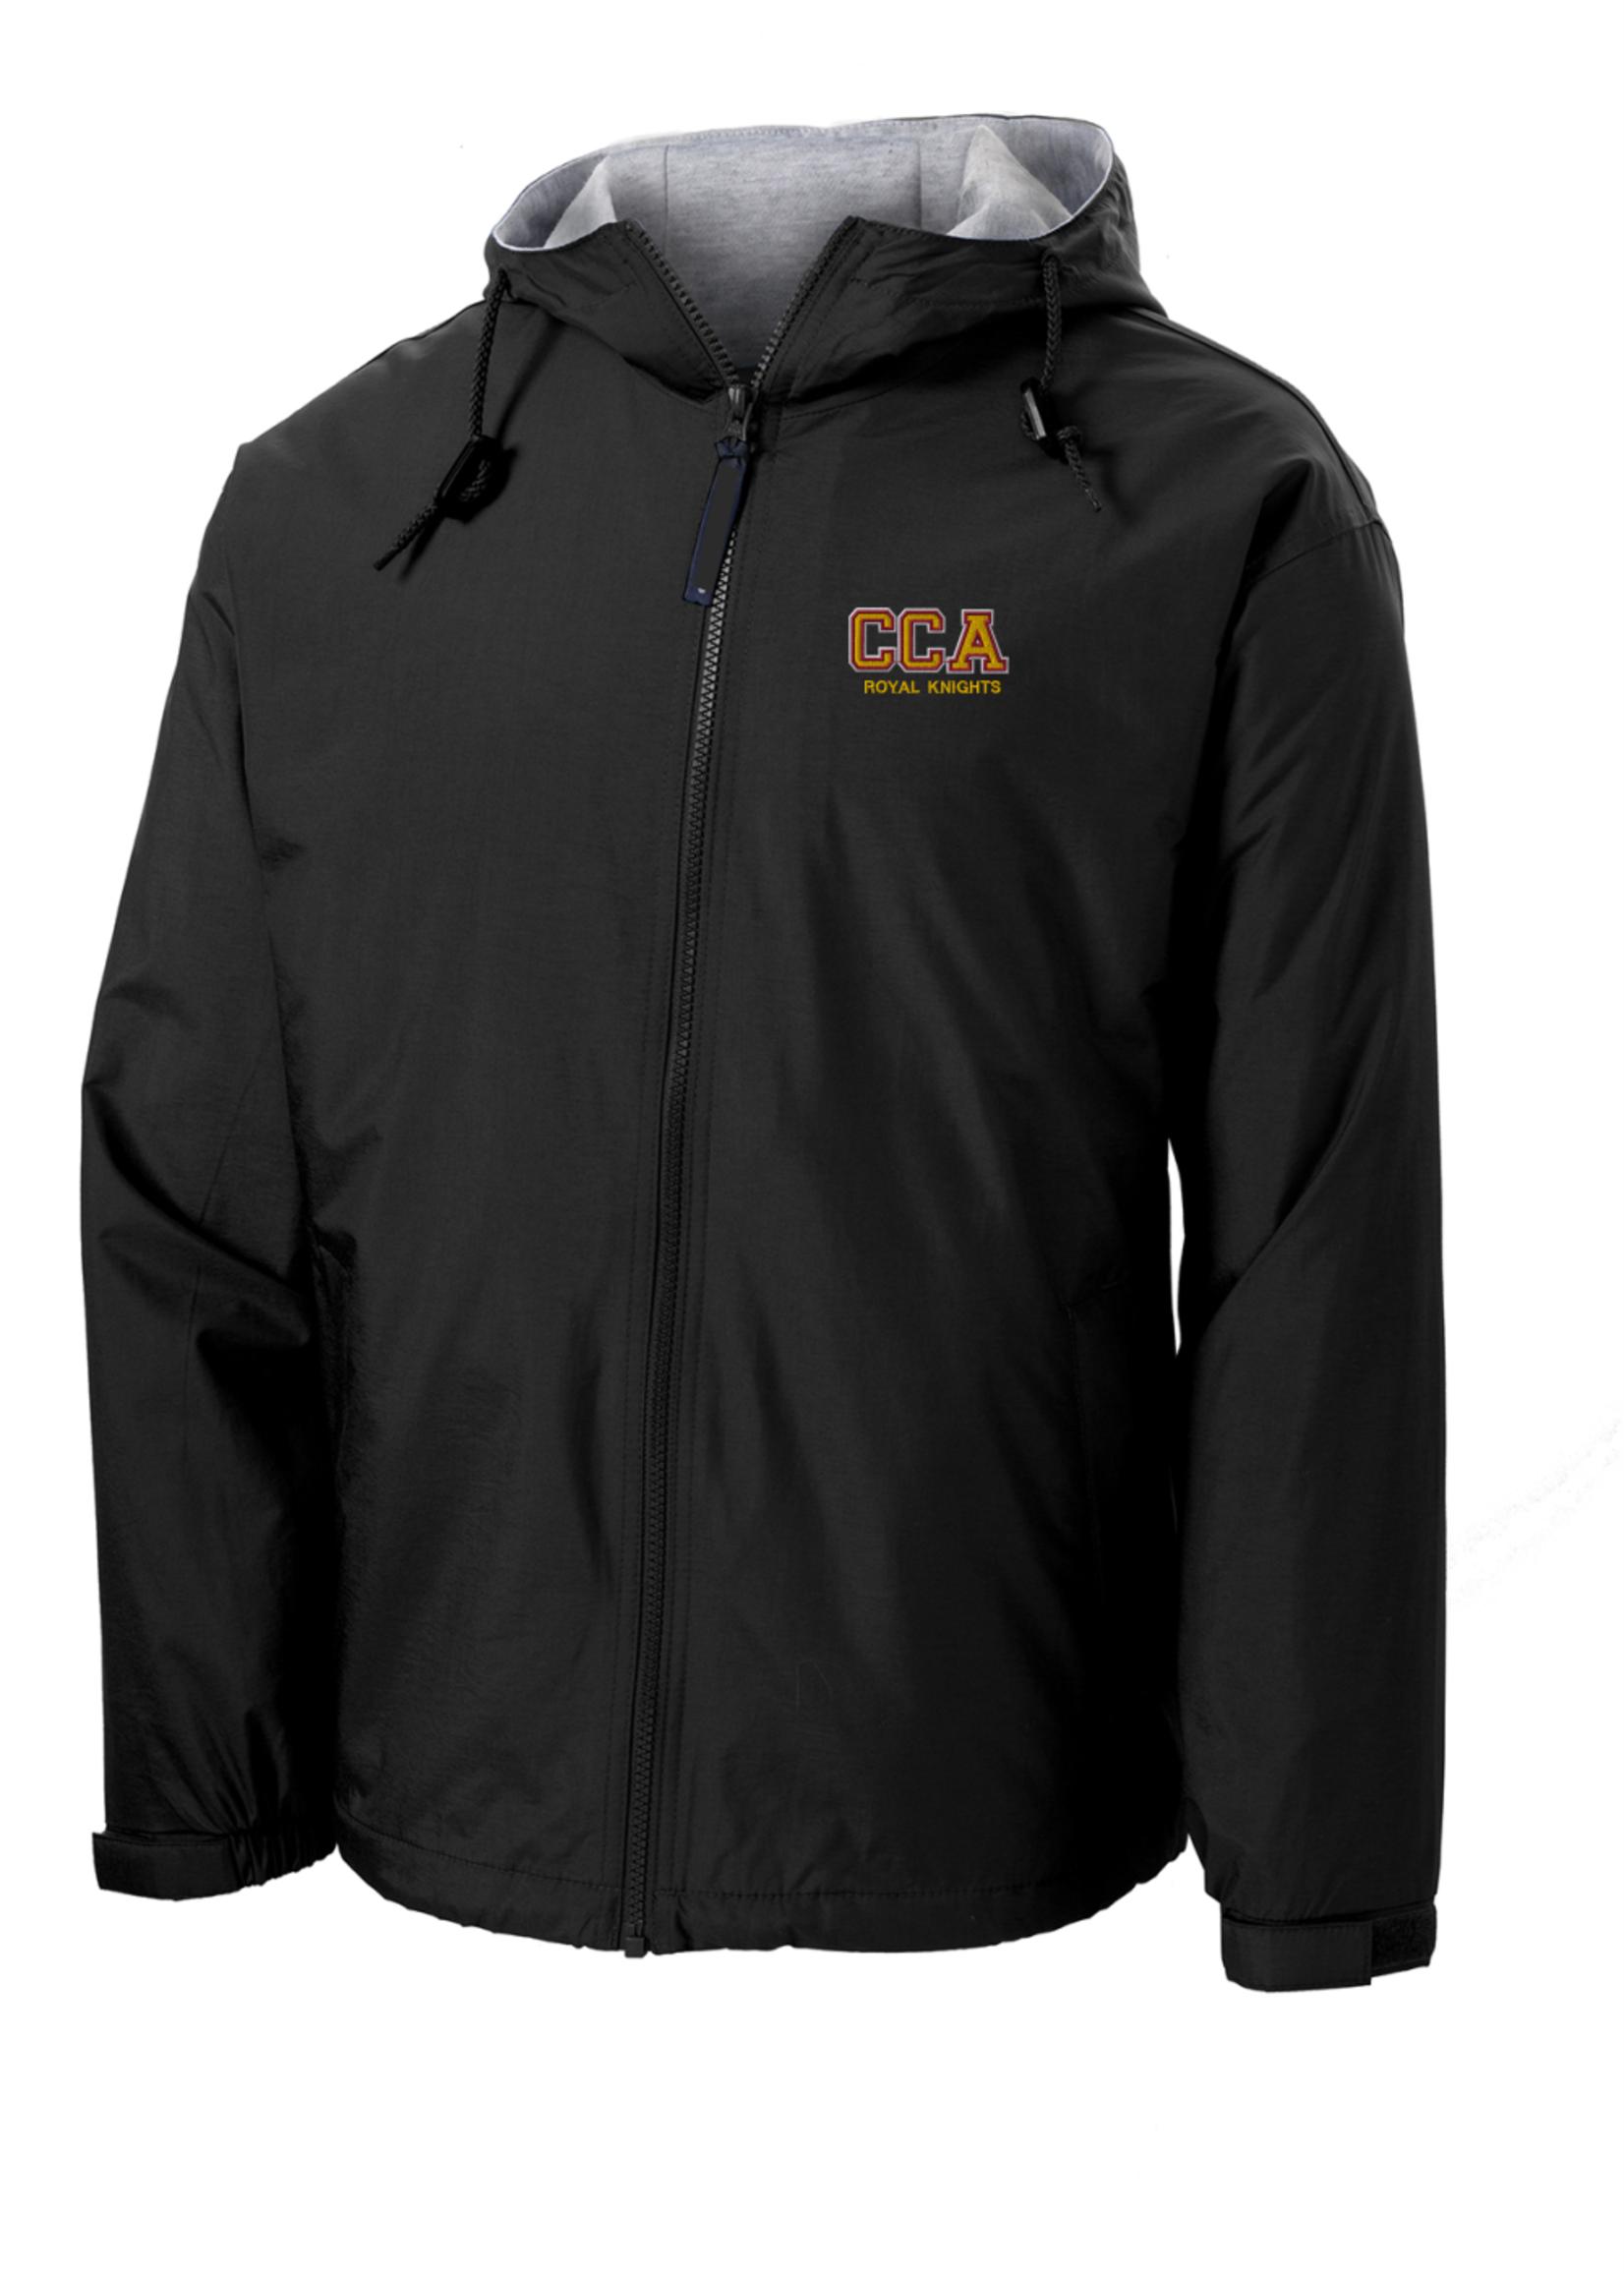 CCA Hooded Black Full Zip Baywatch Jacket